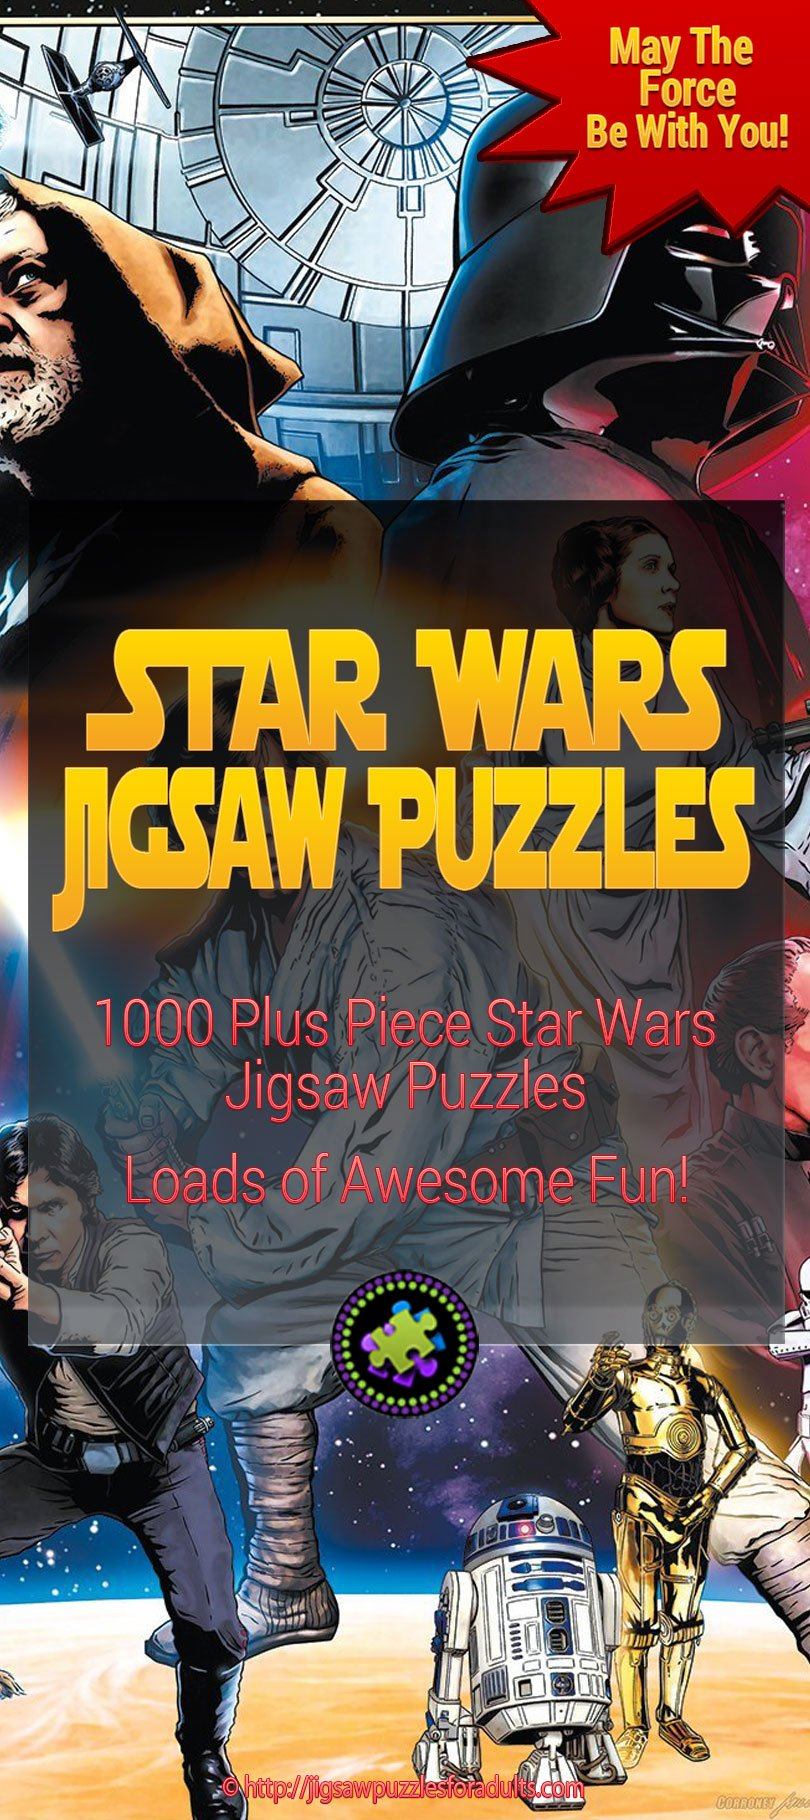 Star Wars Puzzles 1000 Pieces